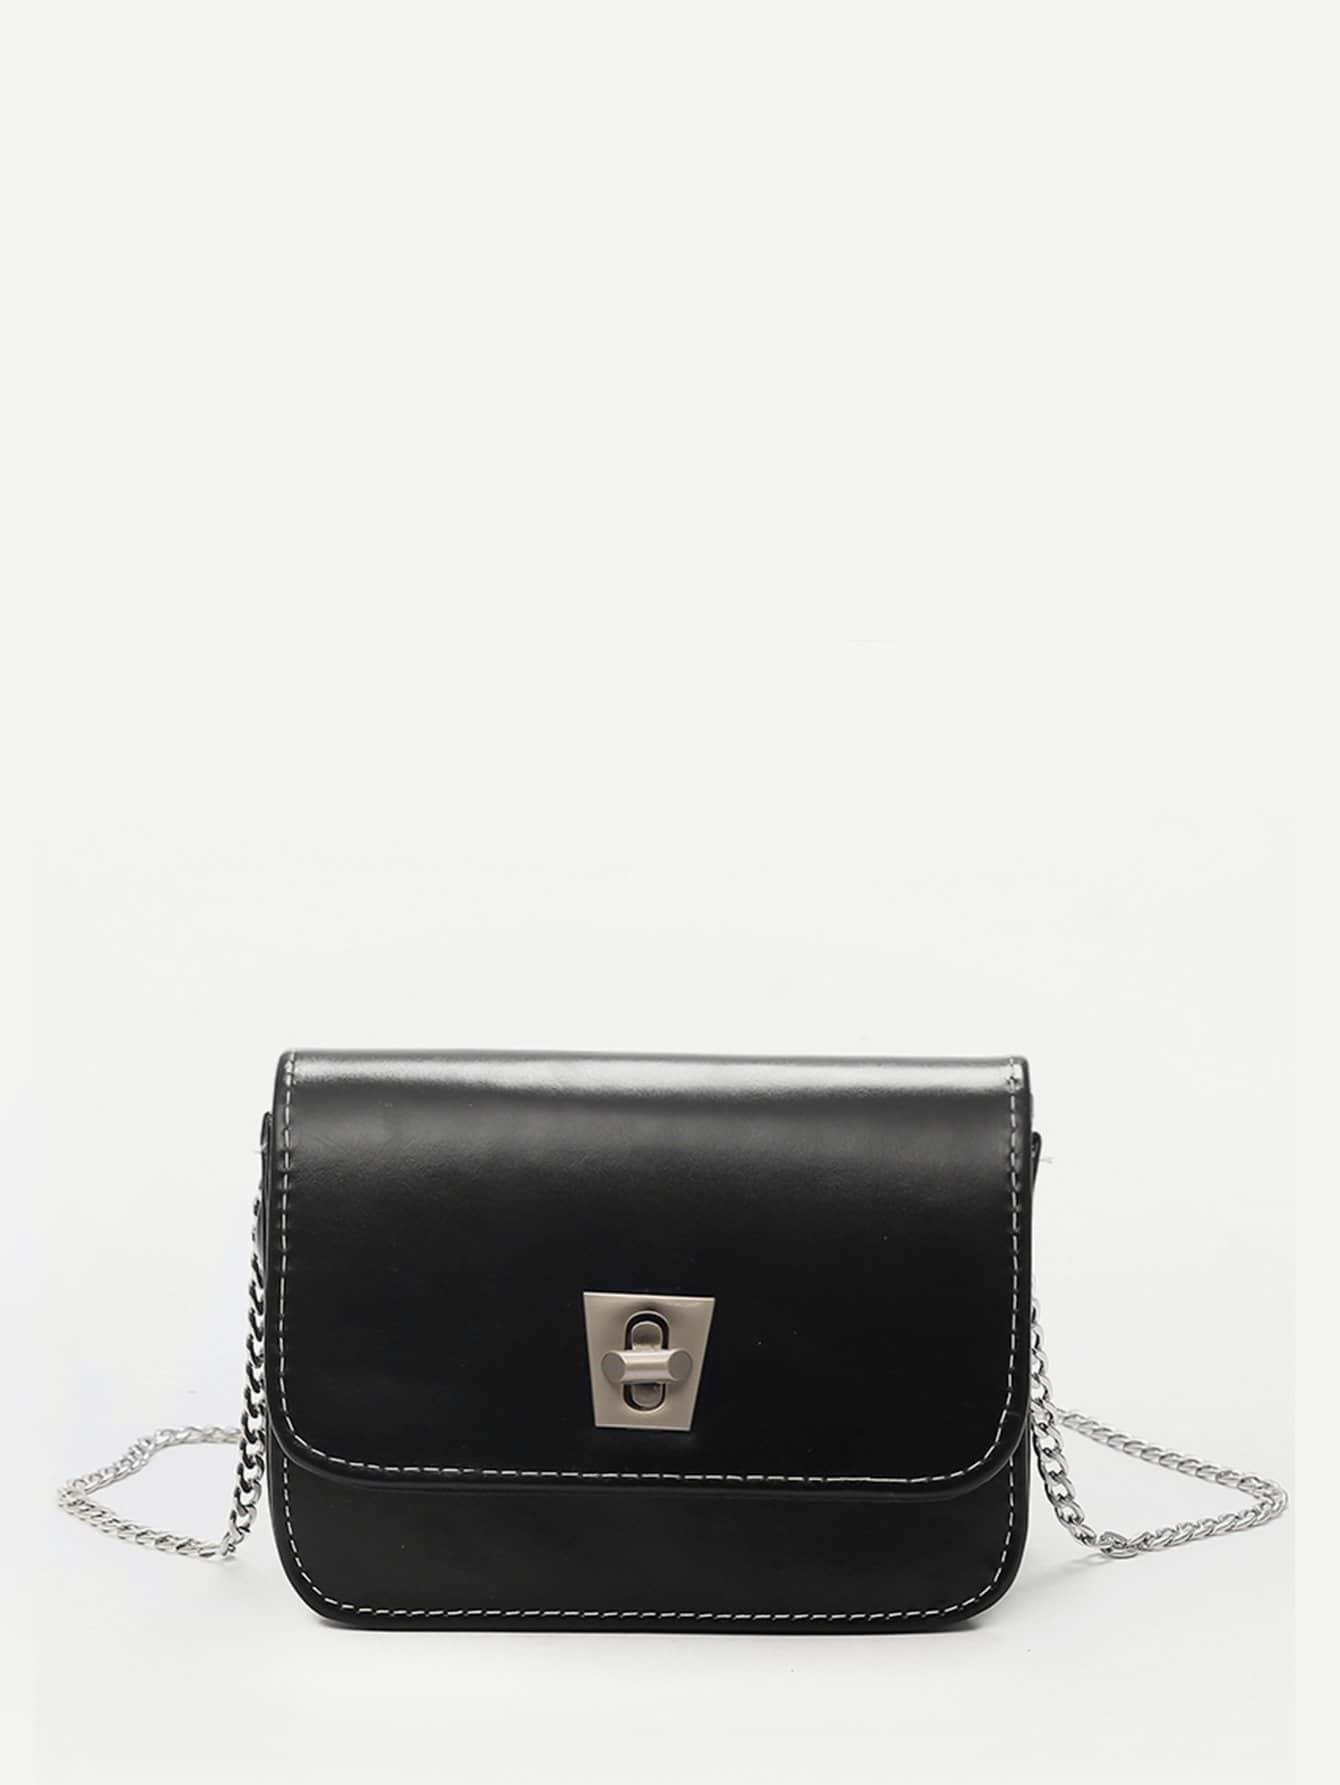 Twist Lock Flap Chain Crossbody Bag 120cm 47 bronze twist o ring bag chain diy metal purse strap 20pcs freeshipping